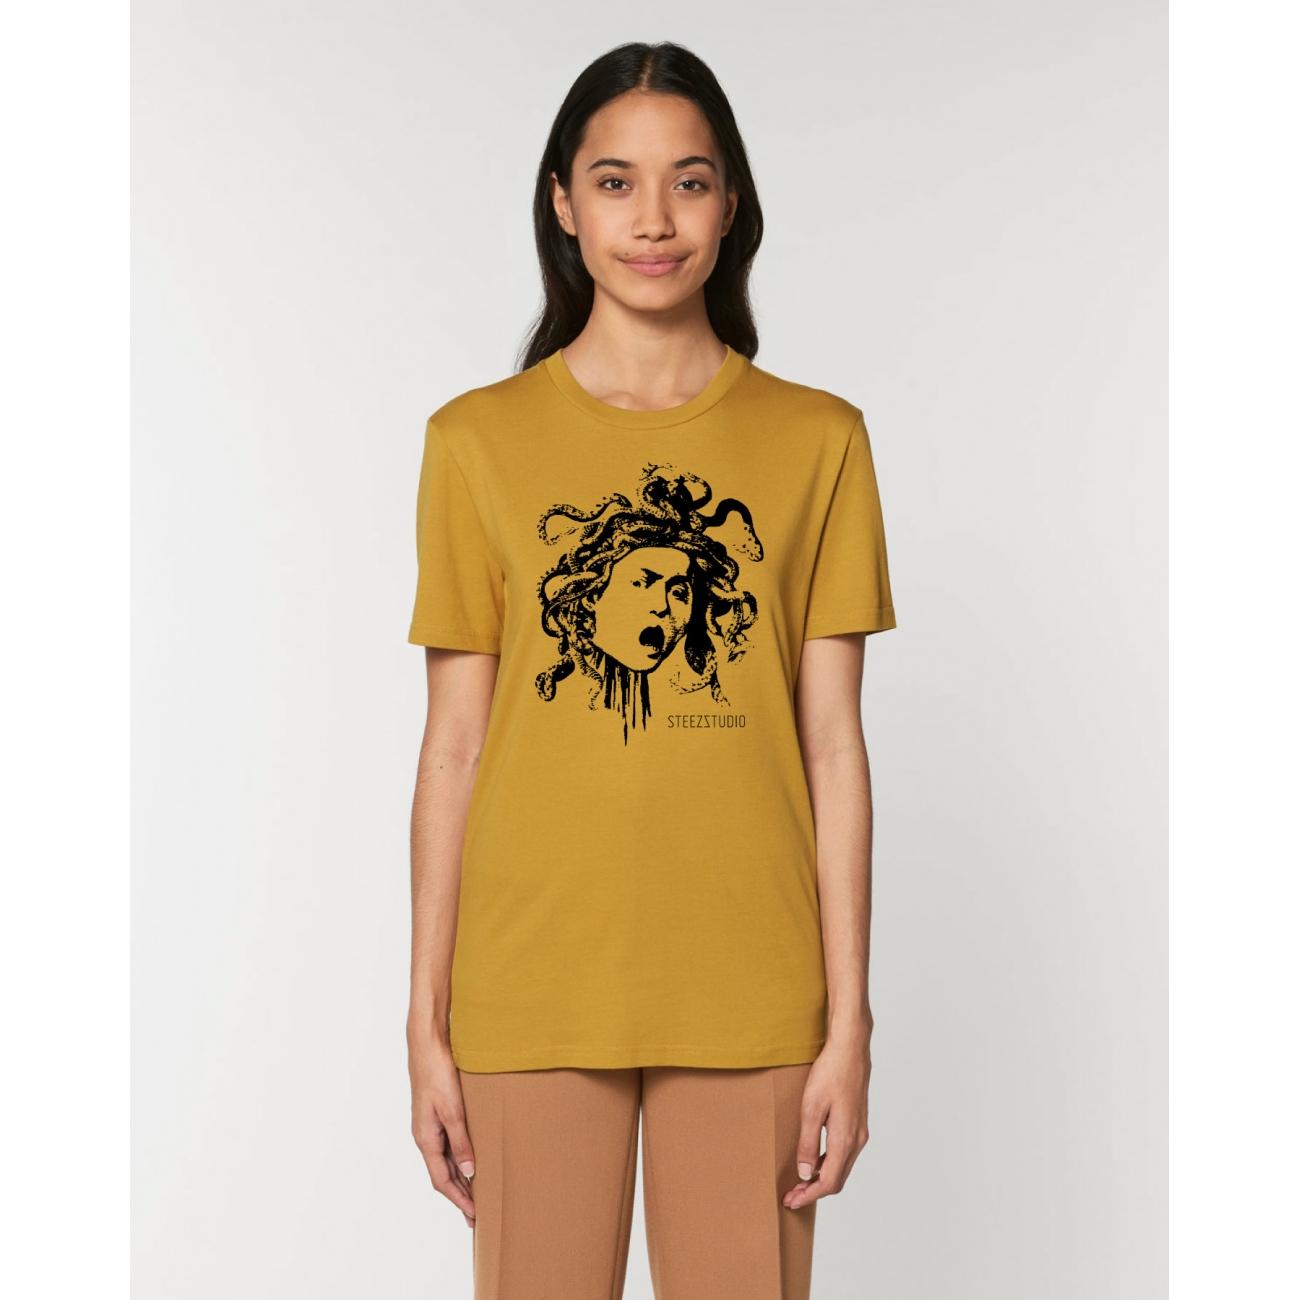 https://tee-shirt-bio.com/10329-thickbox_default/tee-shirt-femme-coton-bio-col-rond-coupe-classique-jaune-ocre-impression-meduse-caravage.jpg